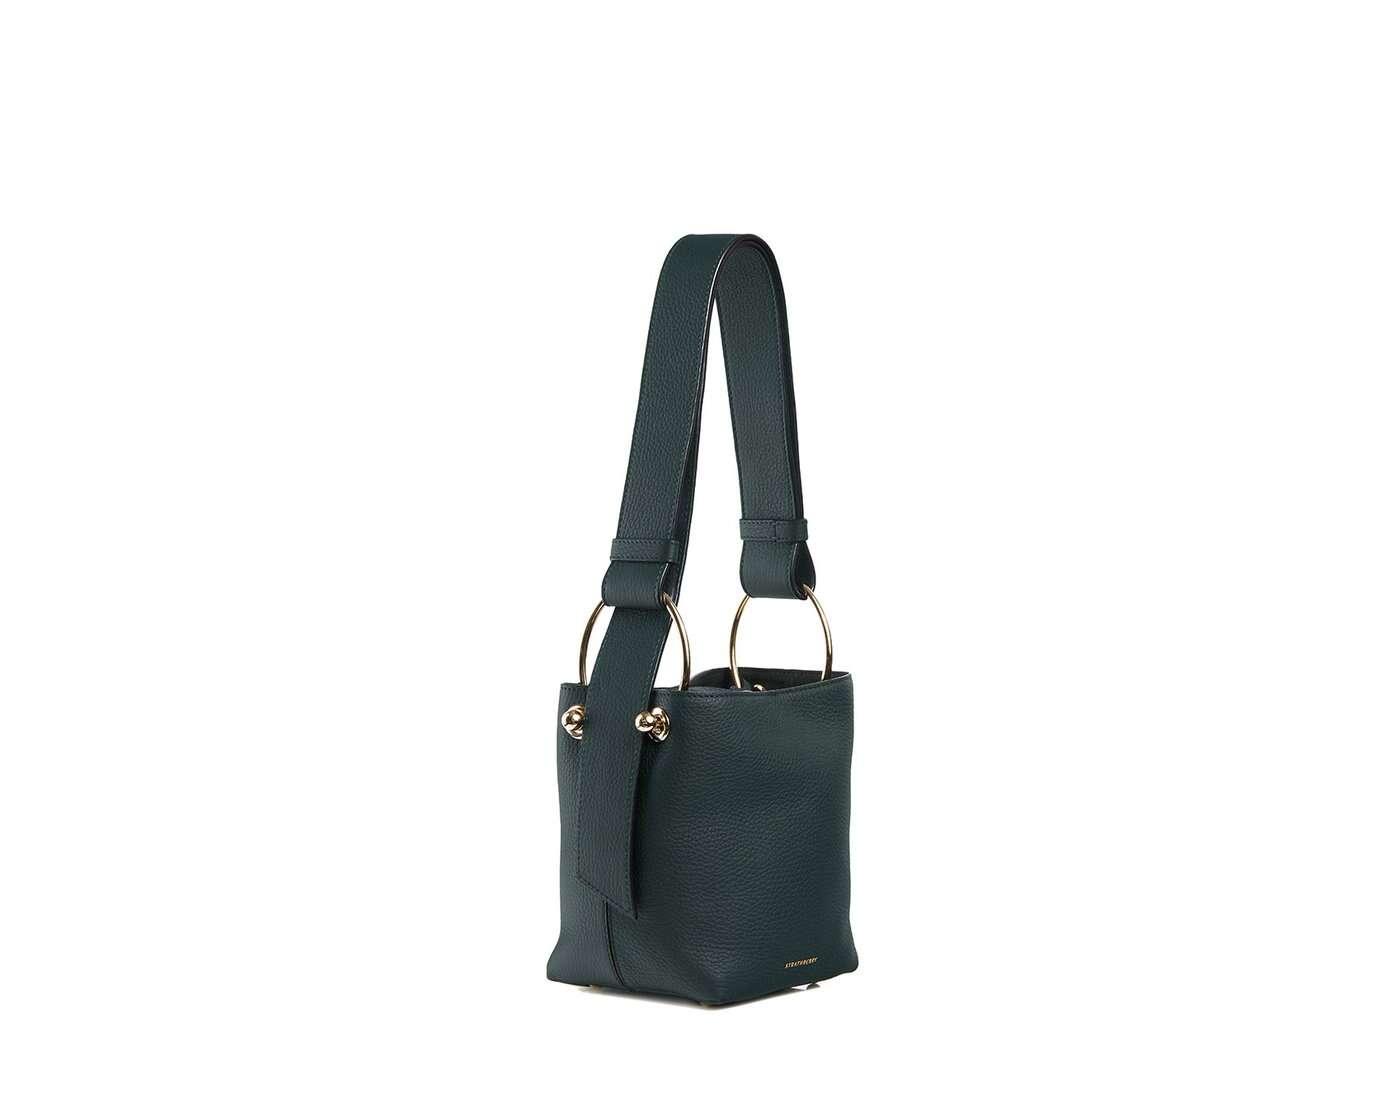 Lana Nano Bucket Bag - Bottle Green